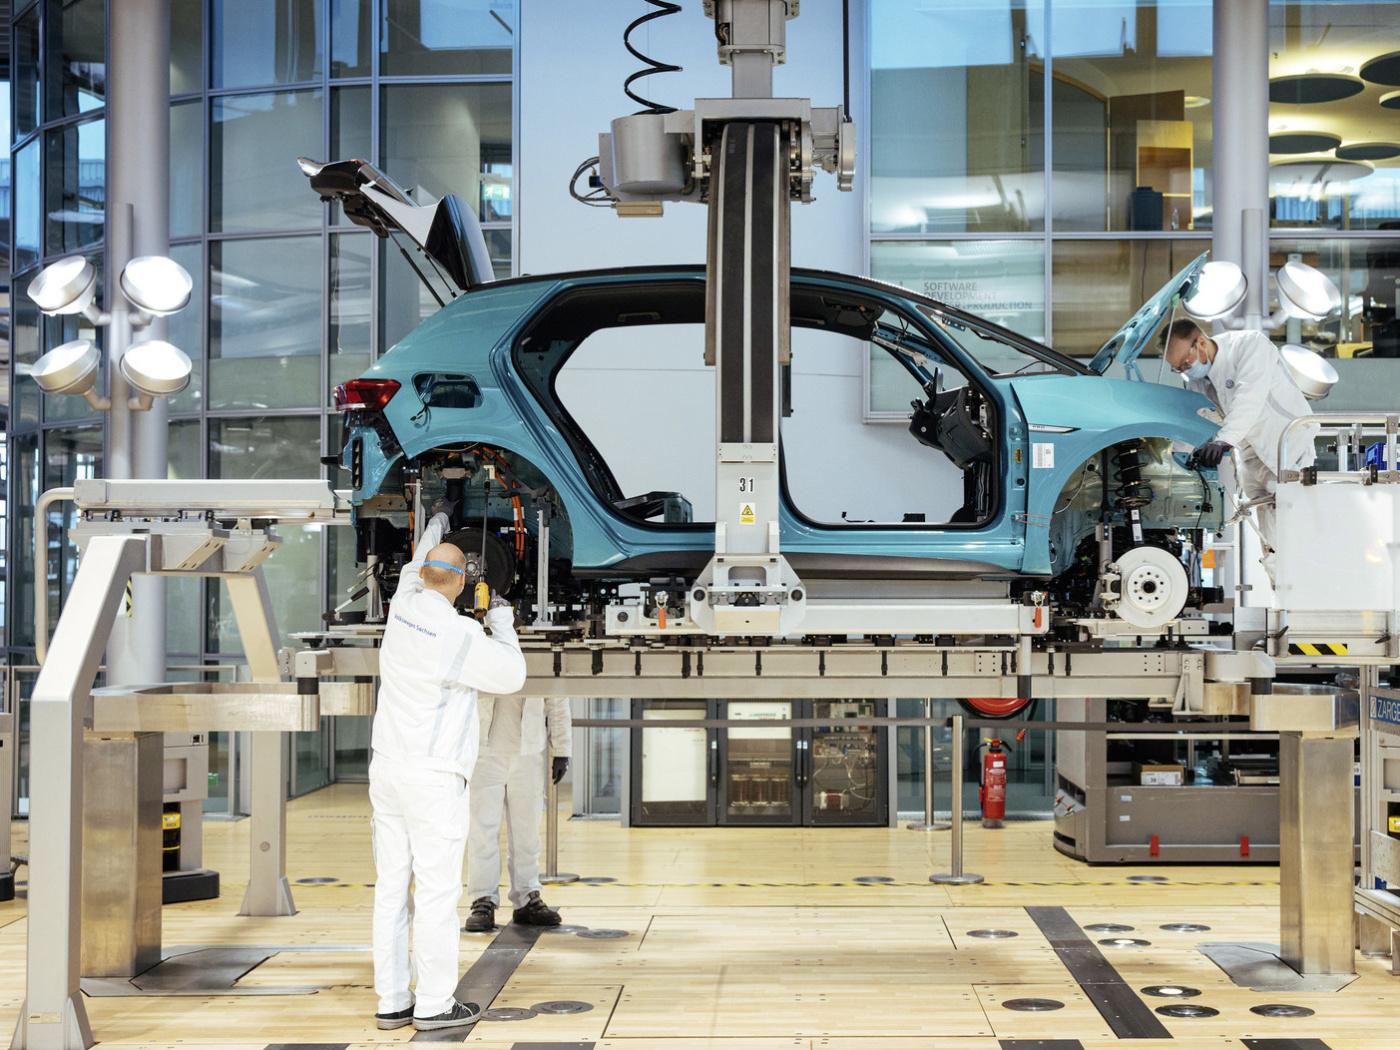 Podívejte se do zákulisí výroby elektrického Volkswagenu ID.3